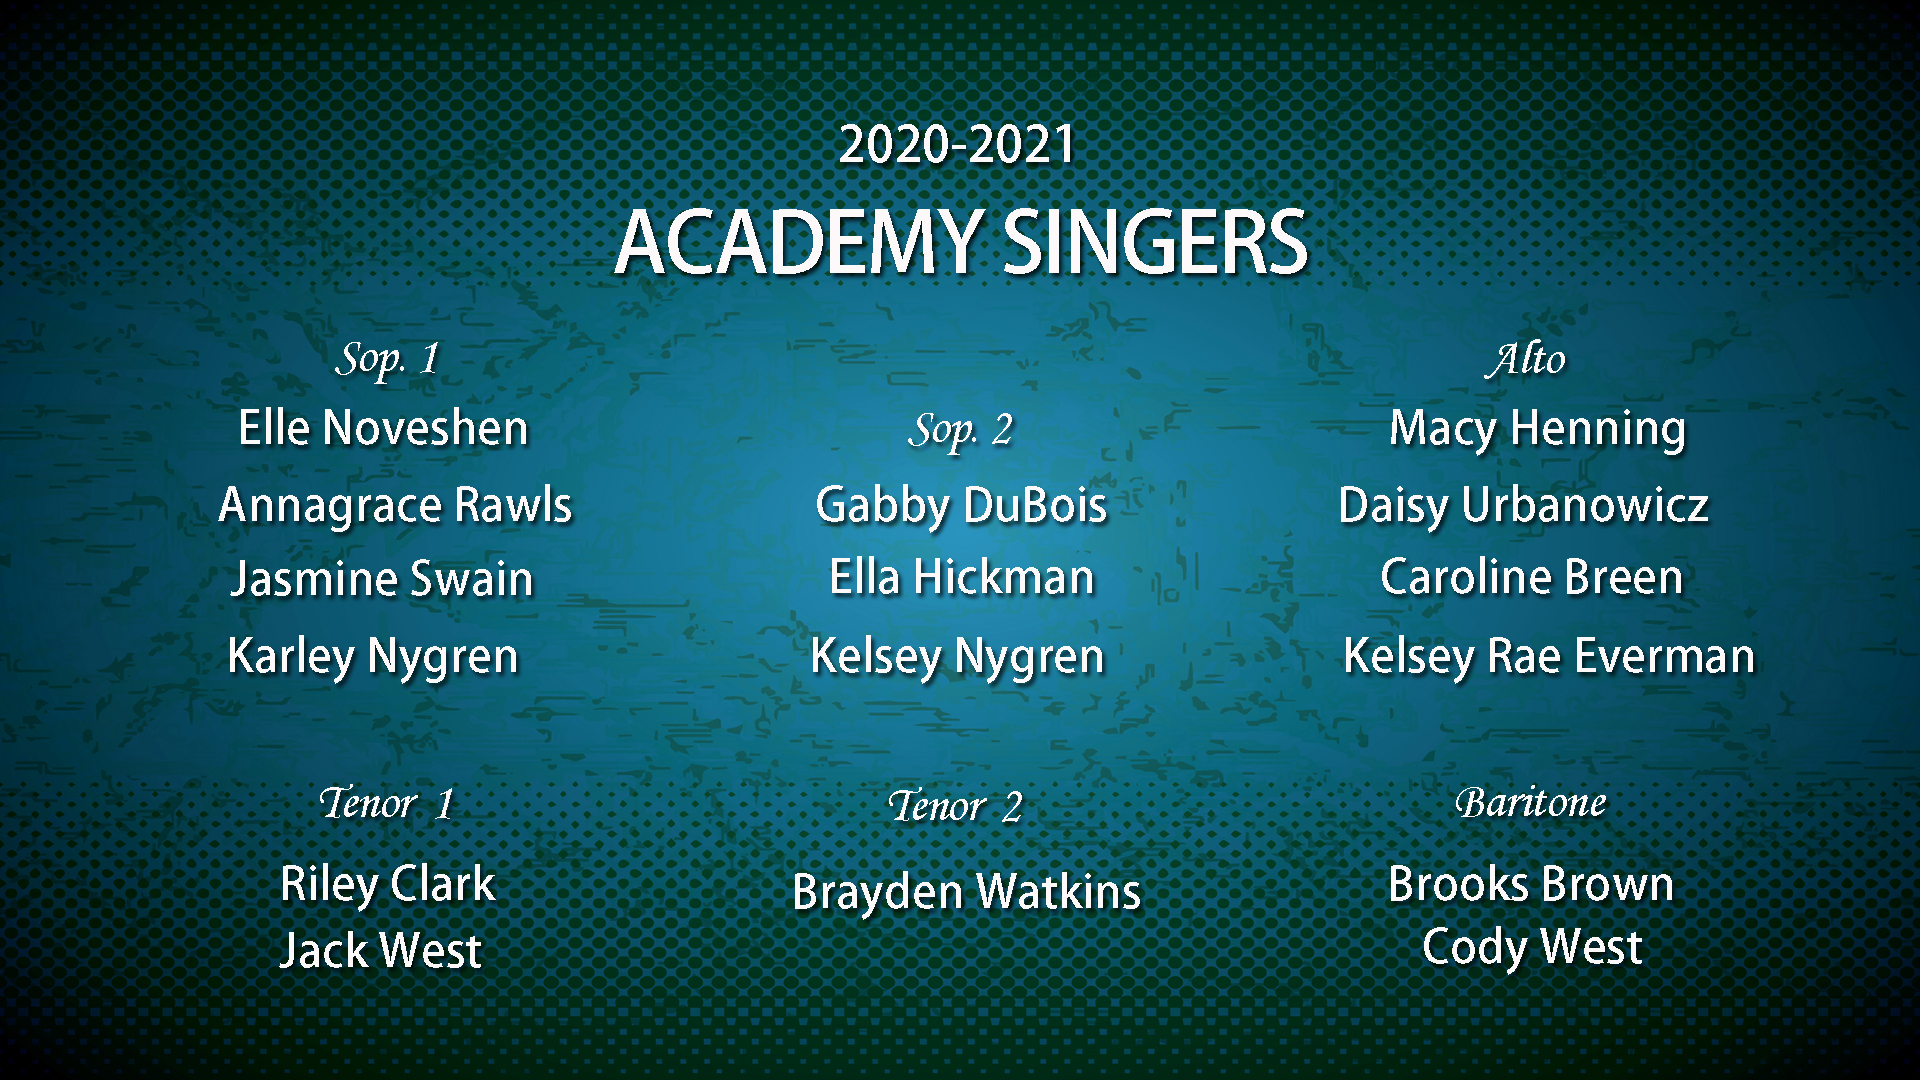 Academy Singers 2020-2021